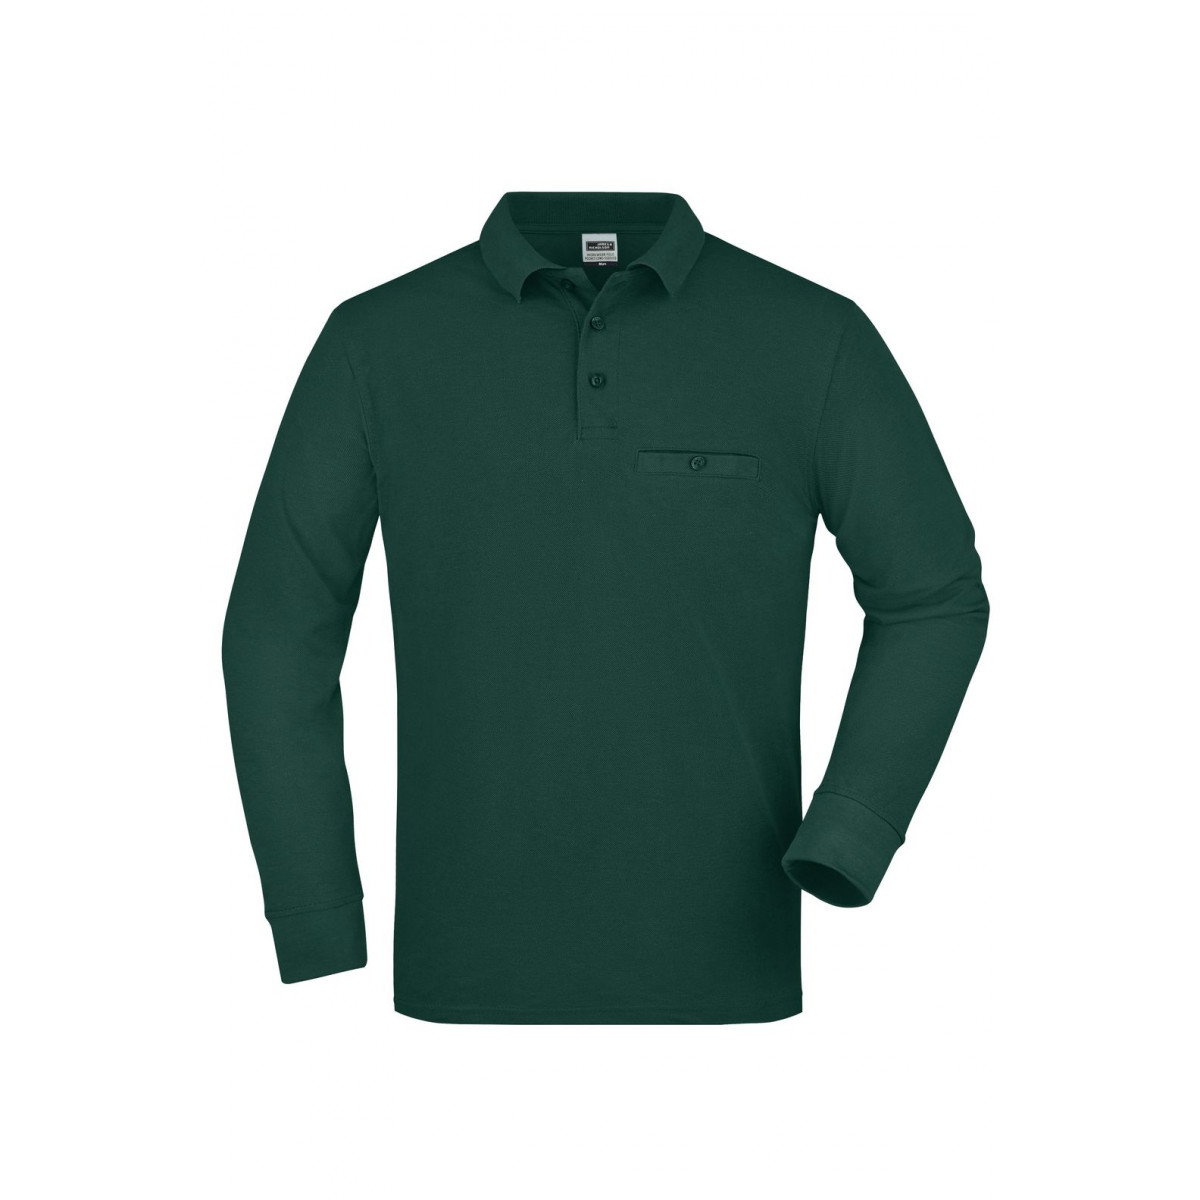 Рубашка поло мужская JN866 Mens Workwear Polo Pocket Longsleeve - Темно-зеленый